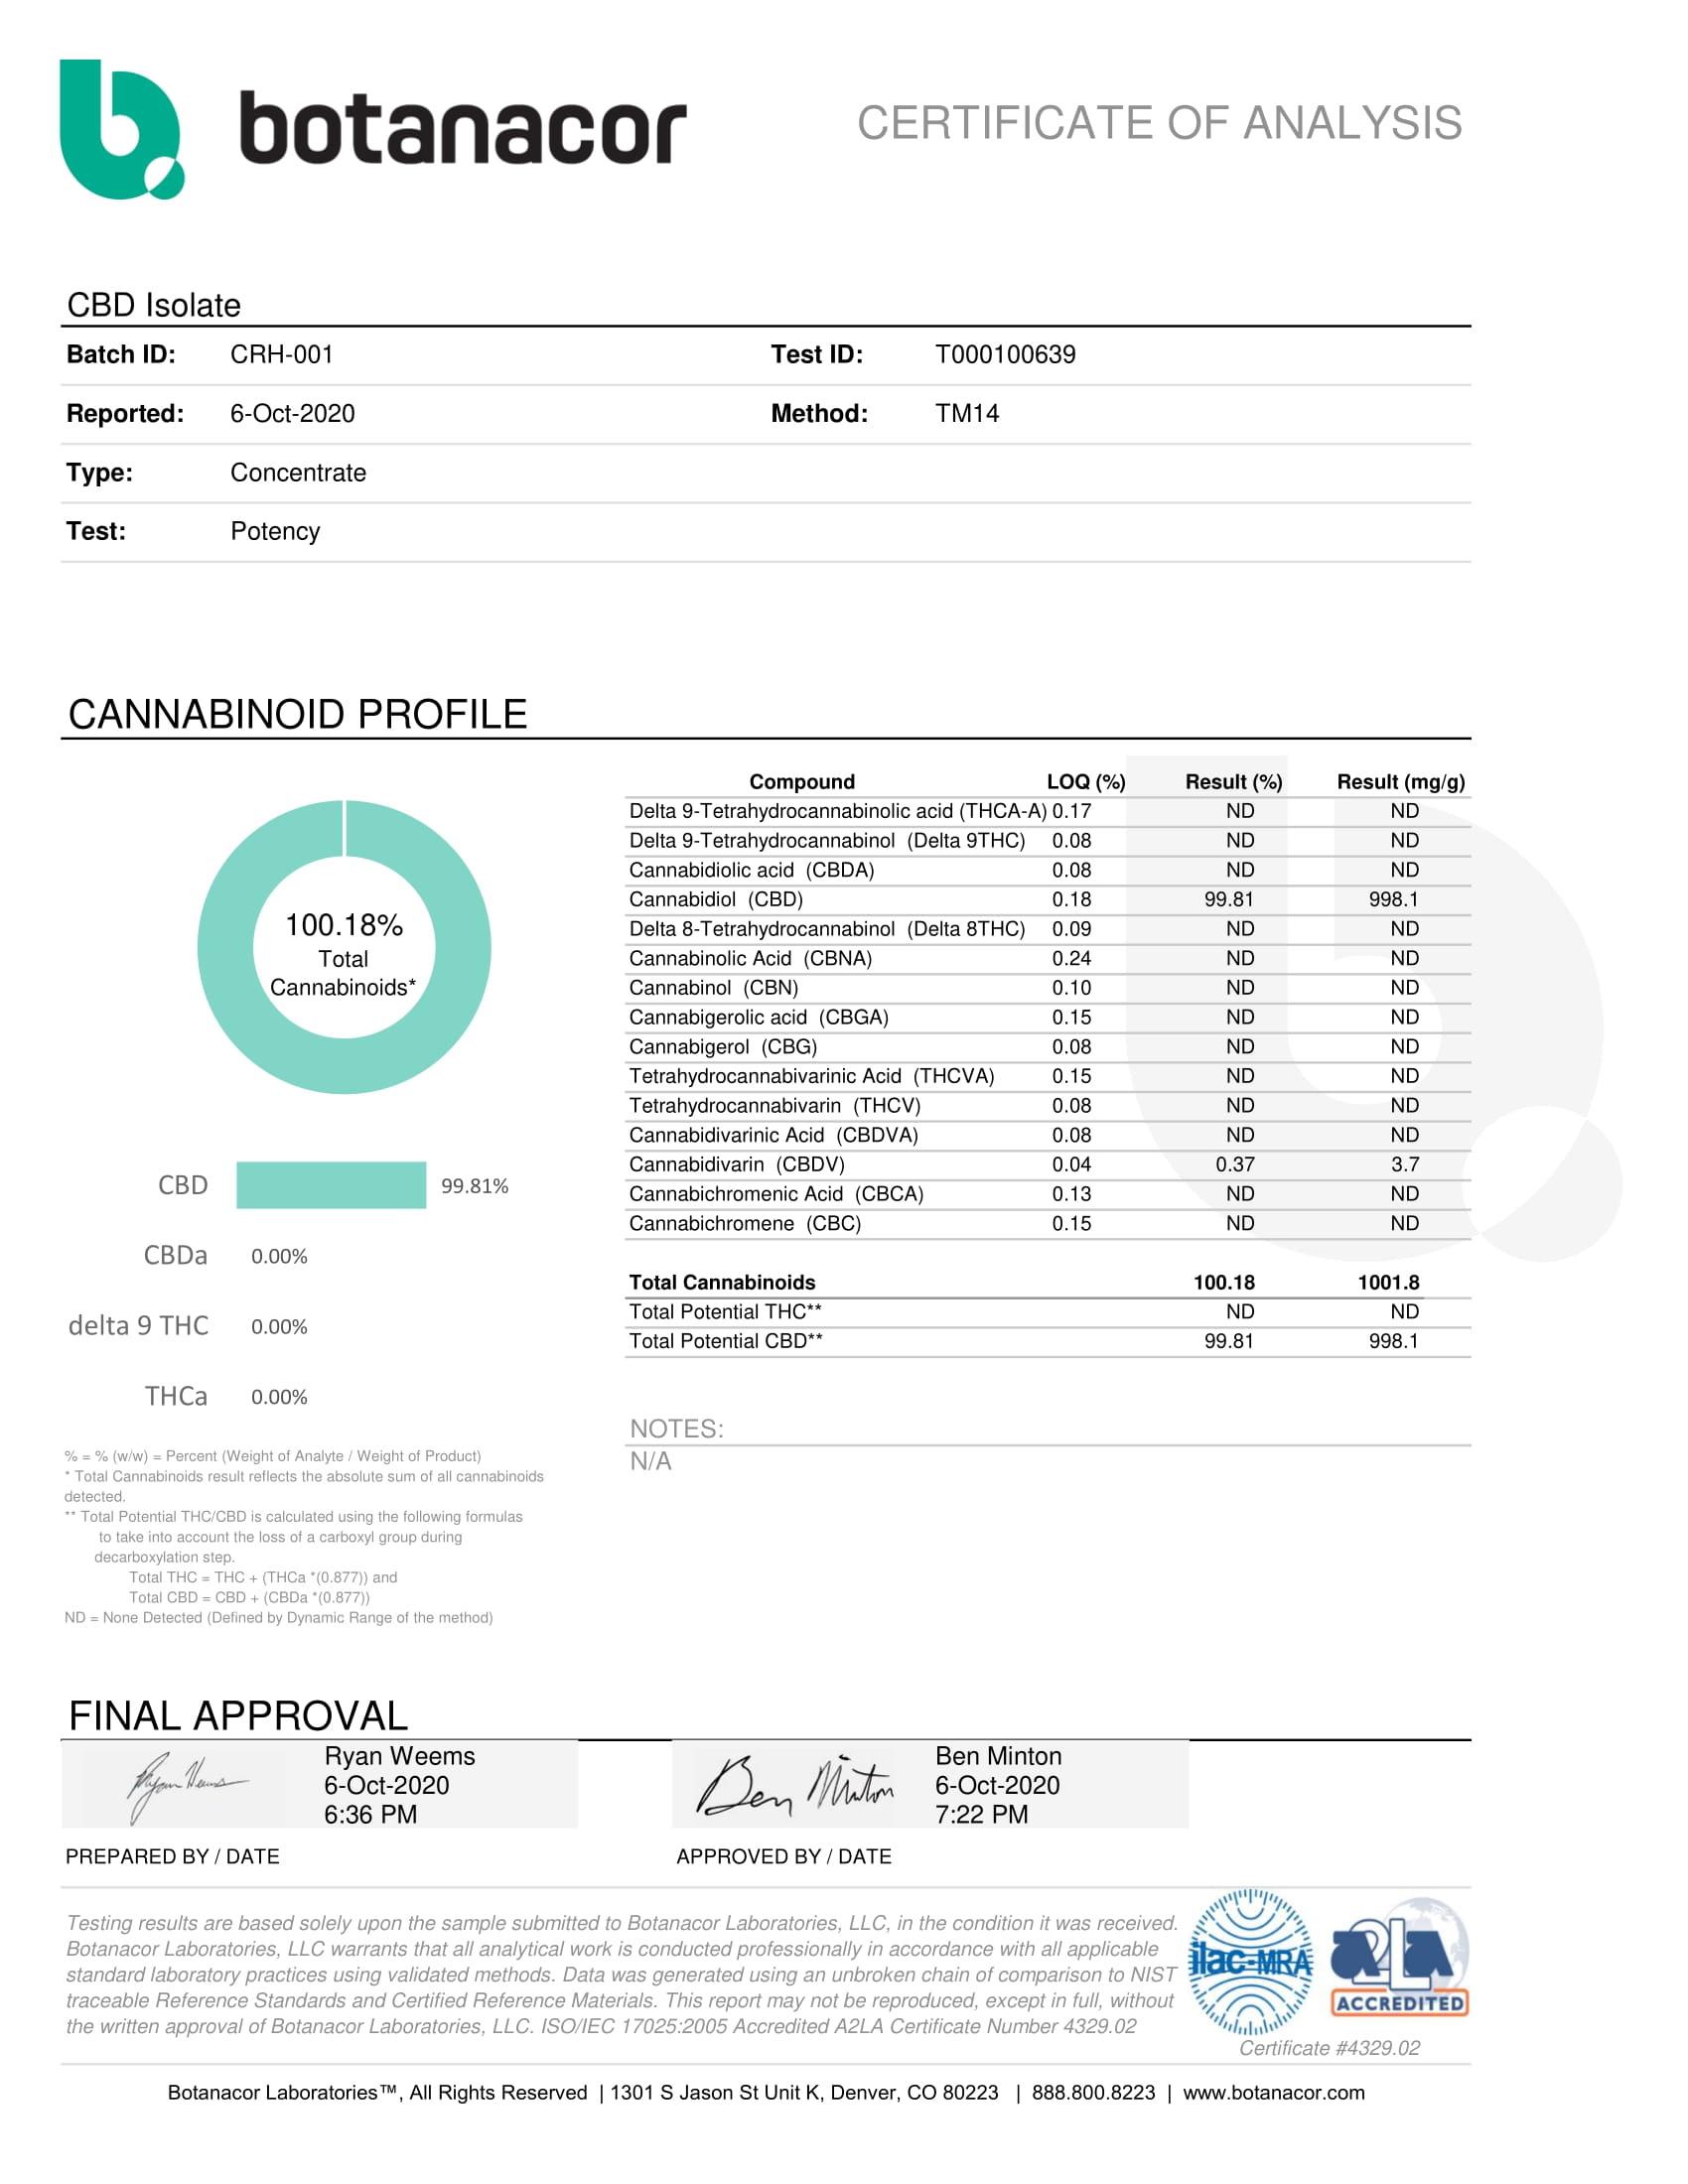 cbd-isolate-t000100639-potency-1.jpg